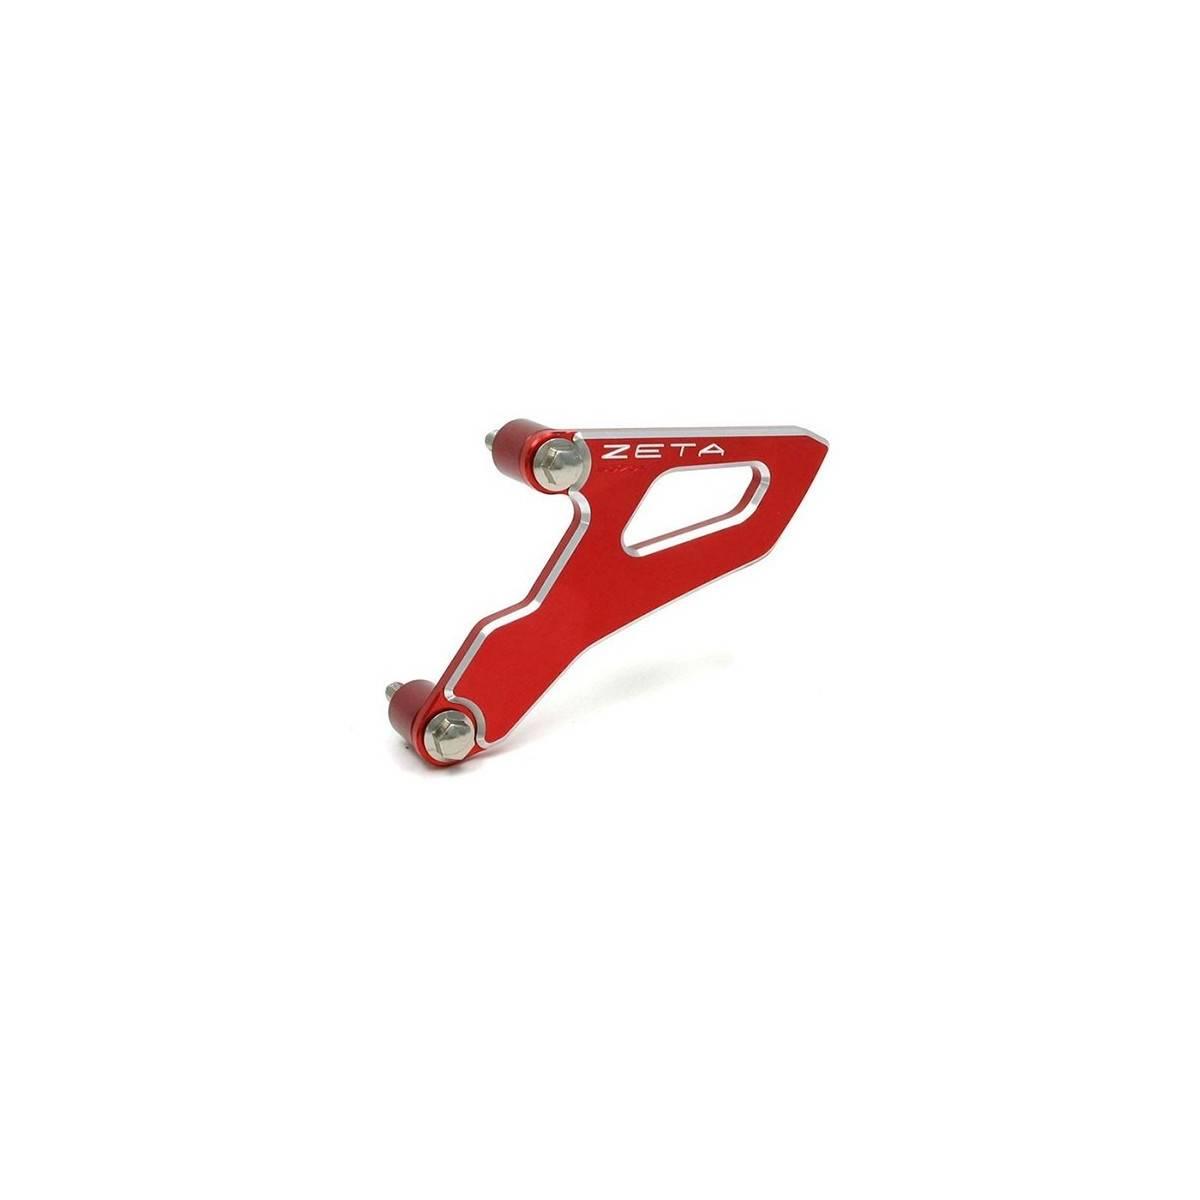 ZE80.9315 - Protector Salida Zeta Aluminio Crf 250 Rojo